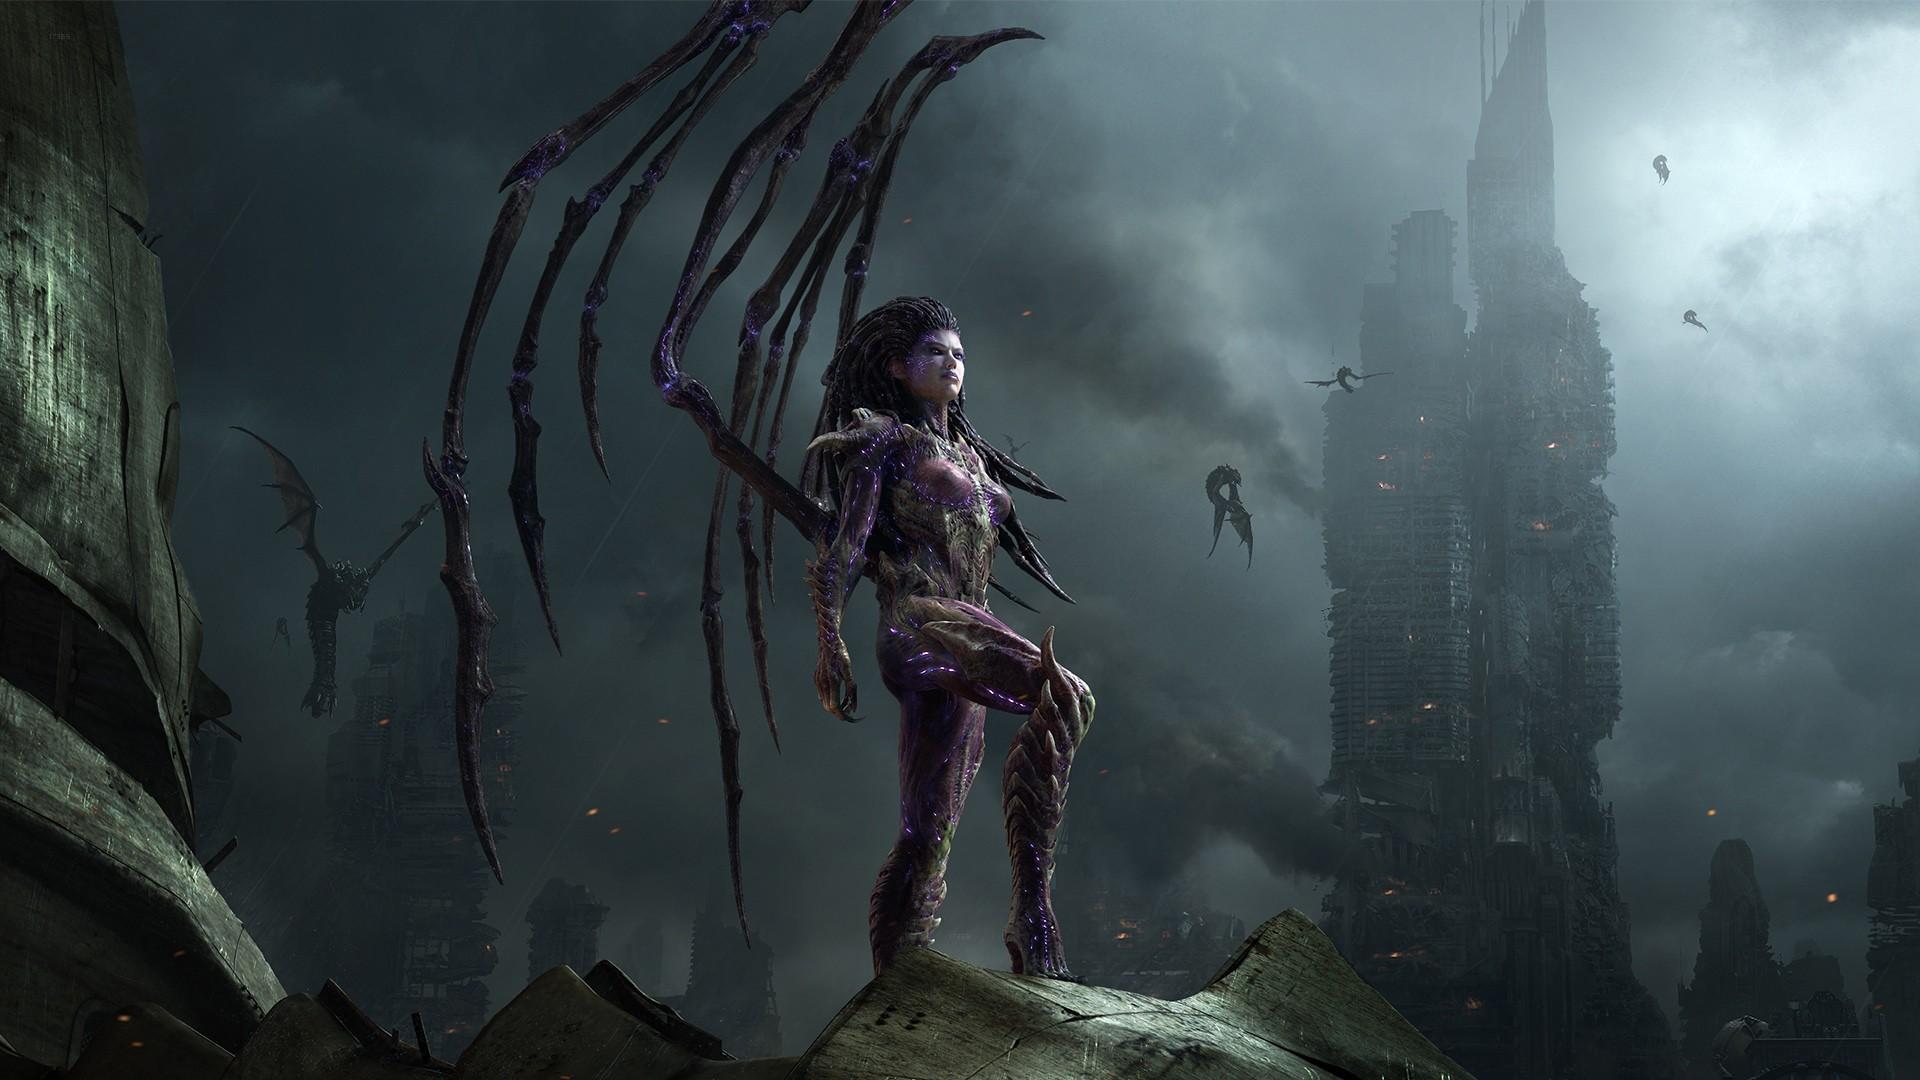 StarCraft Queen of Blades dark demons fantasy dragons post apocalyptic 1920x1080